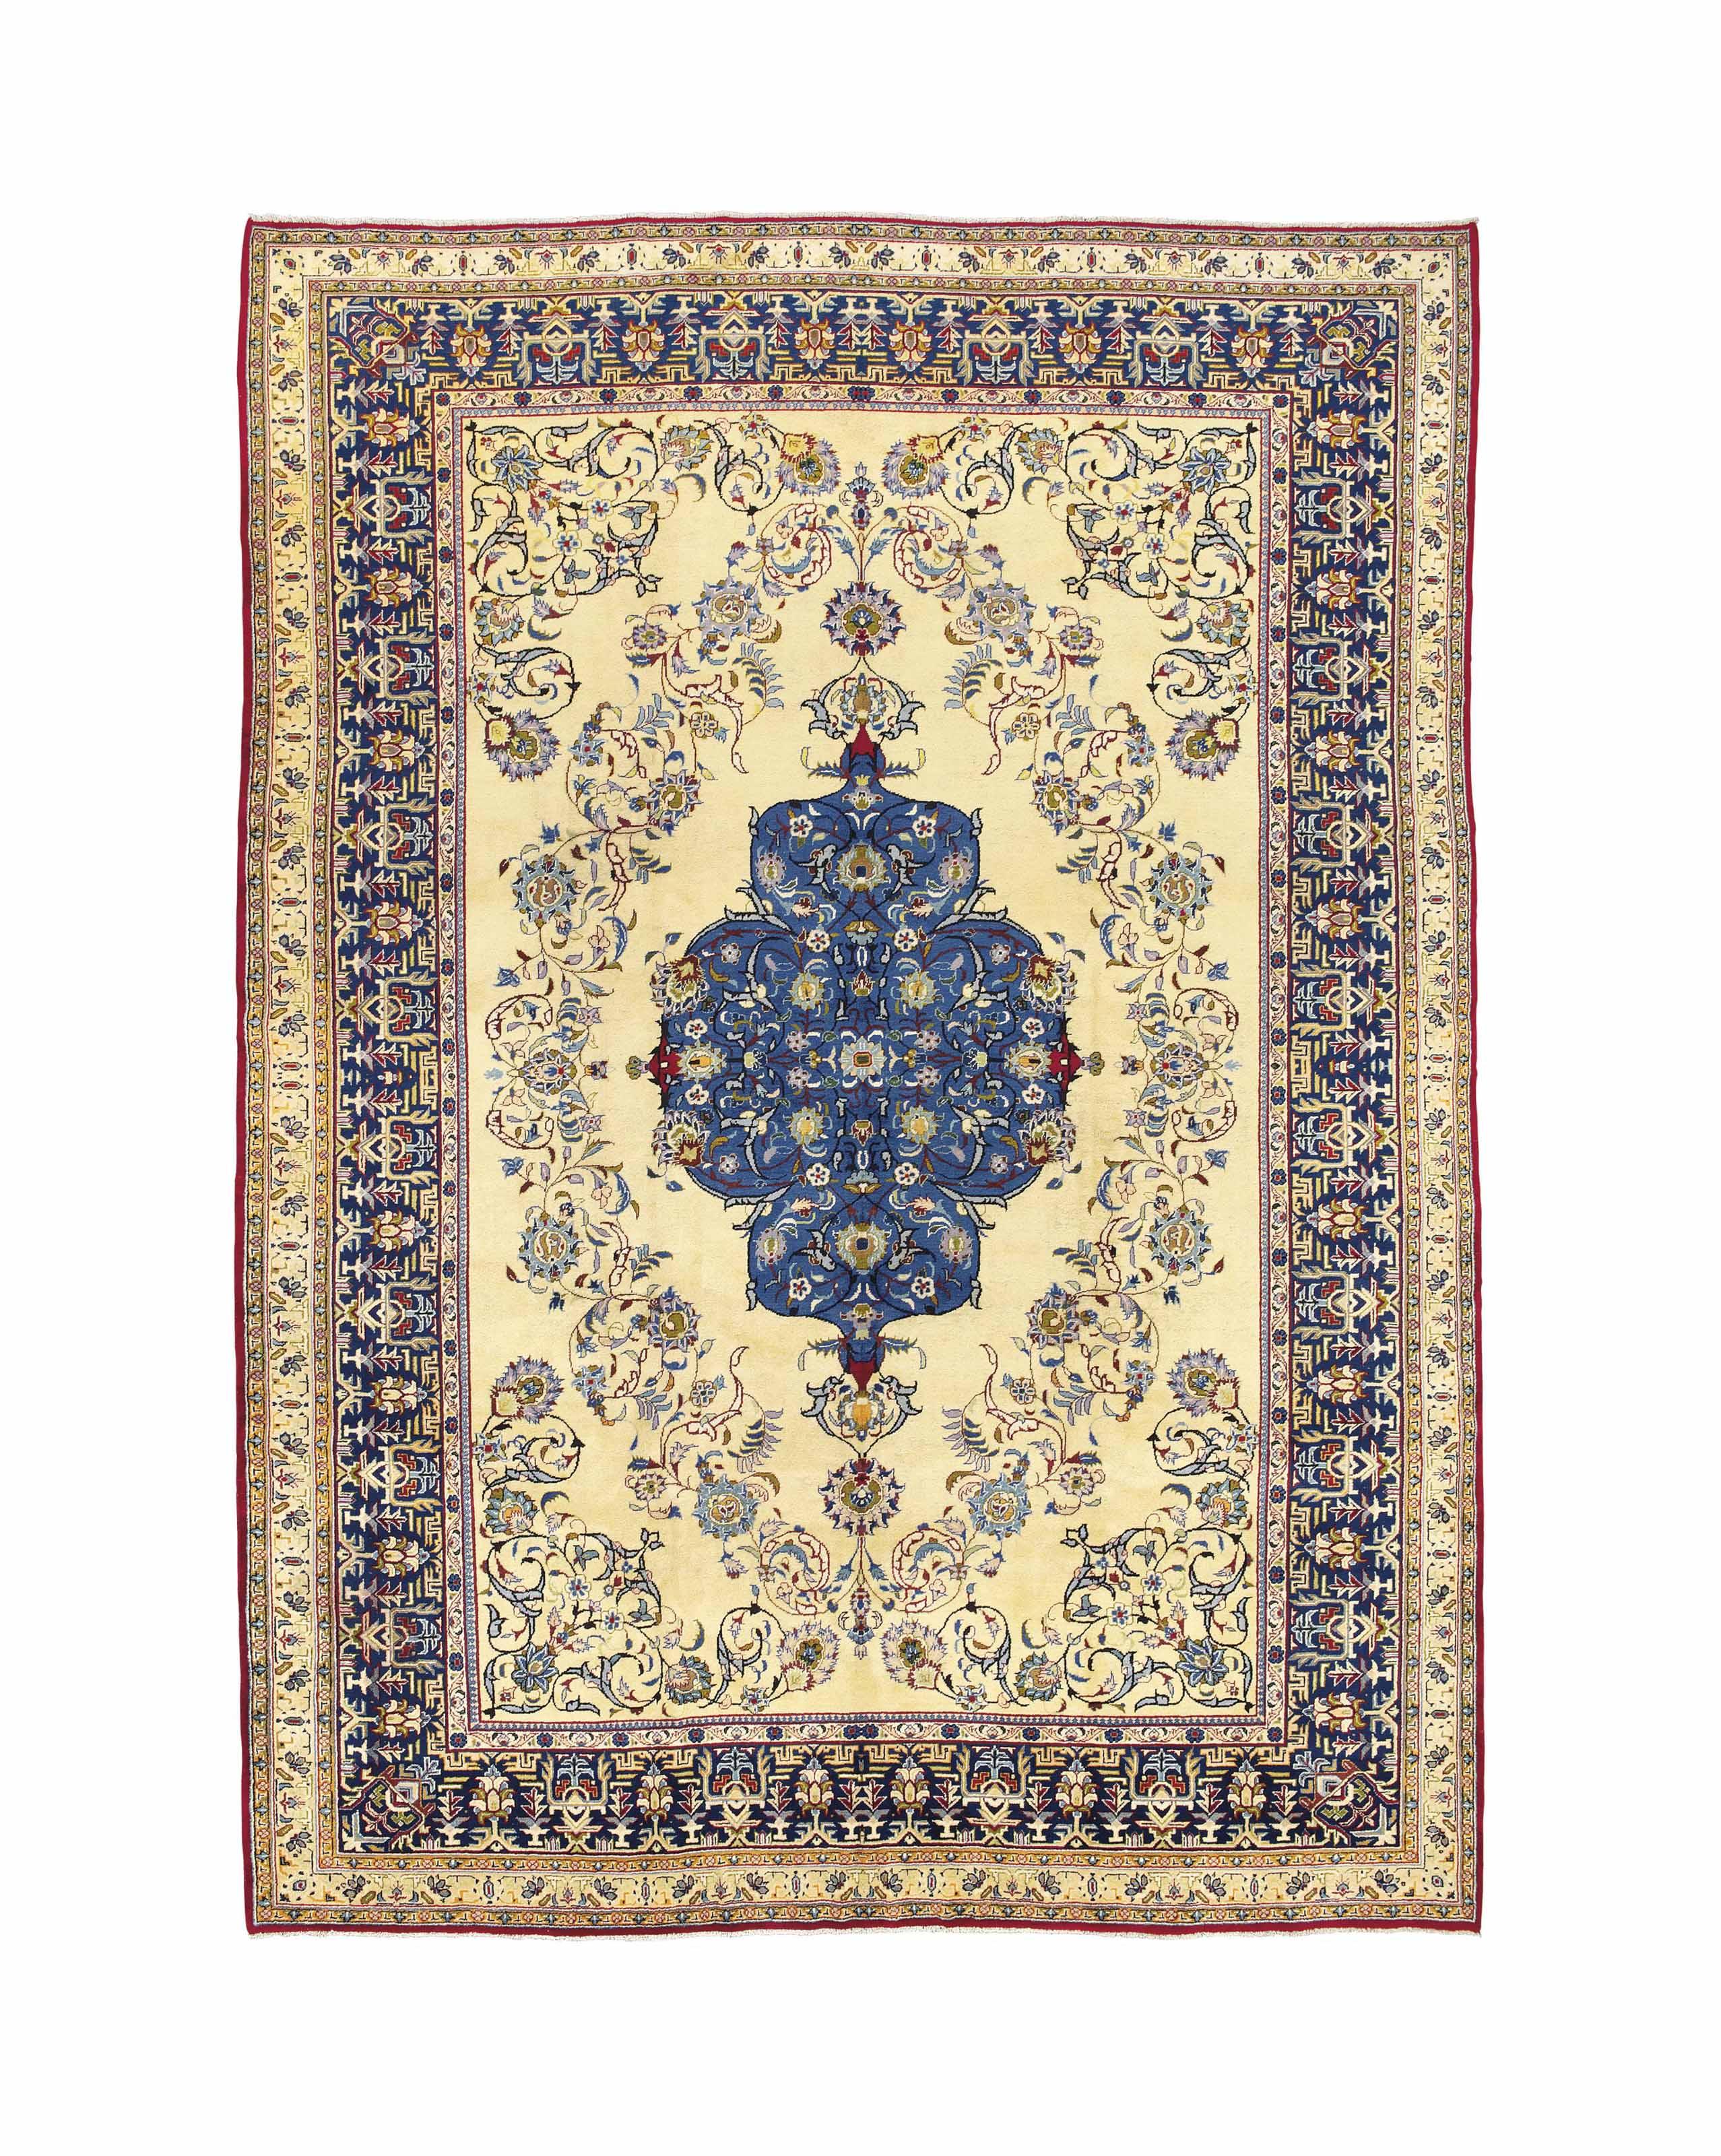 An unusual Isfahan carpet